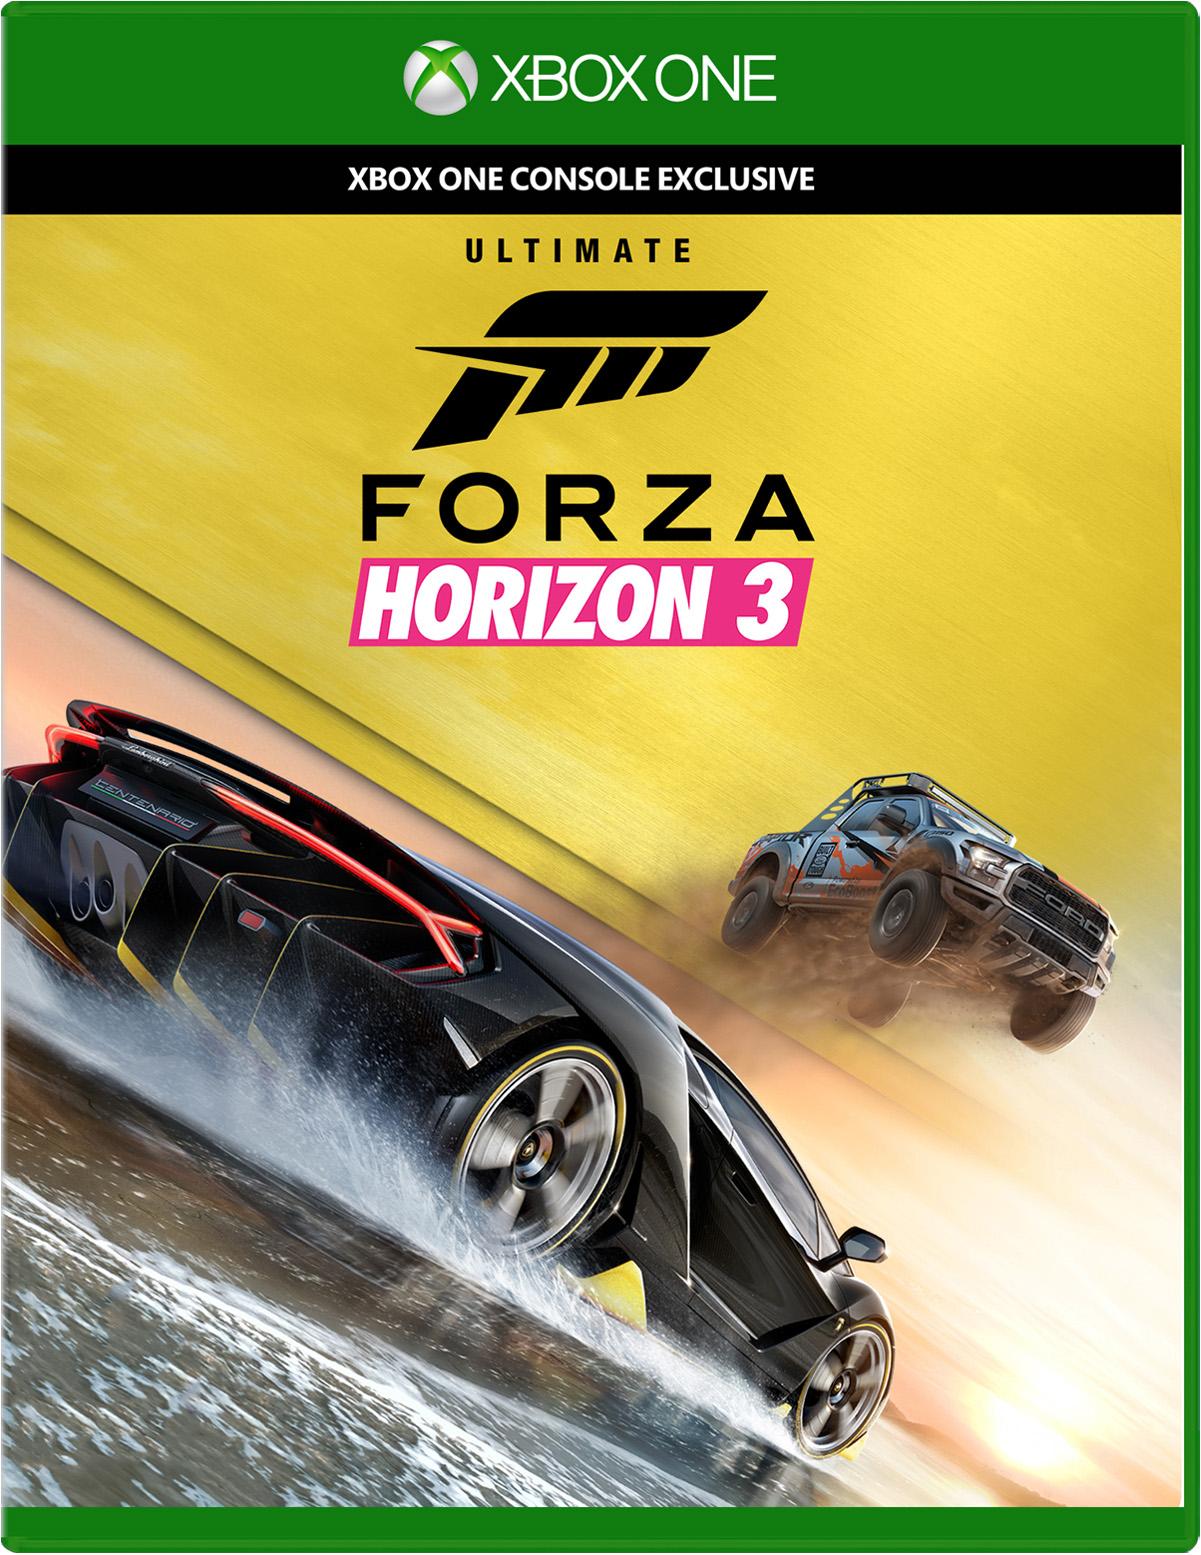 Forza Horizon 3 for Xbox One Deal